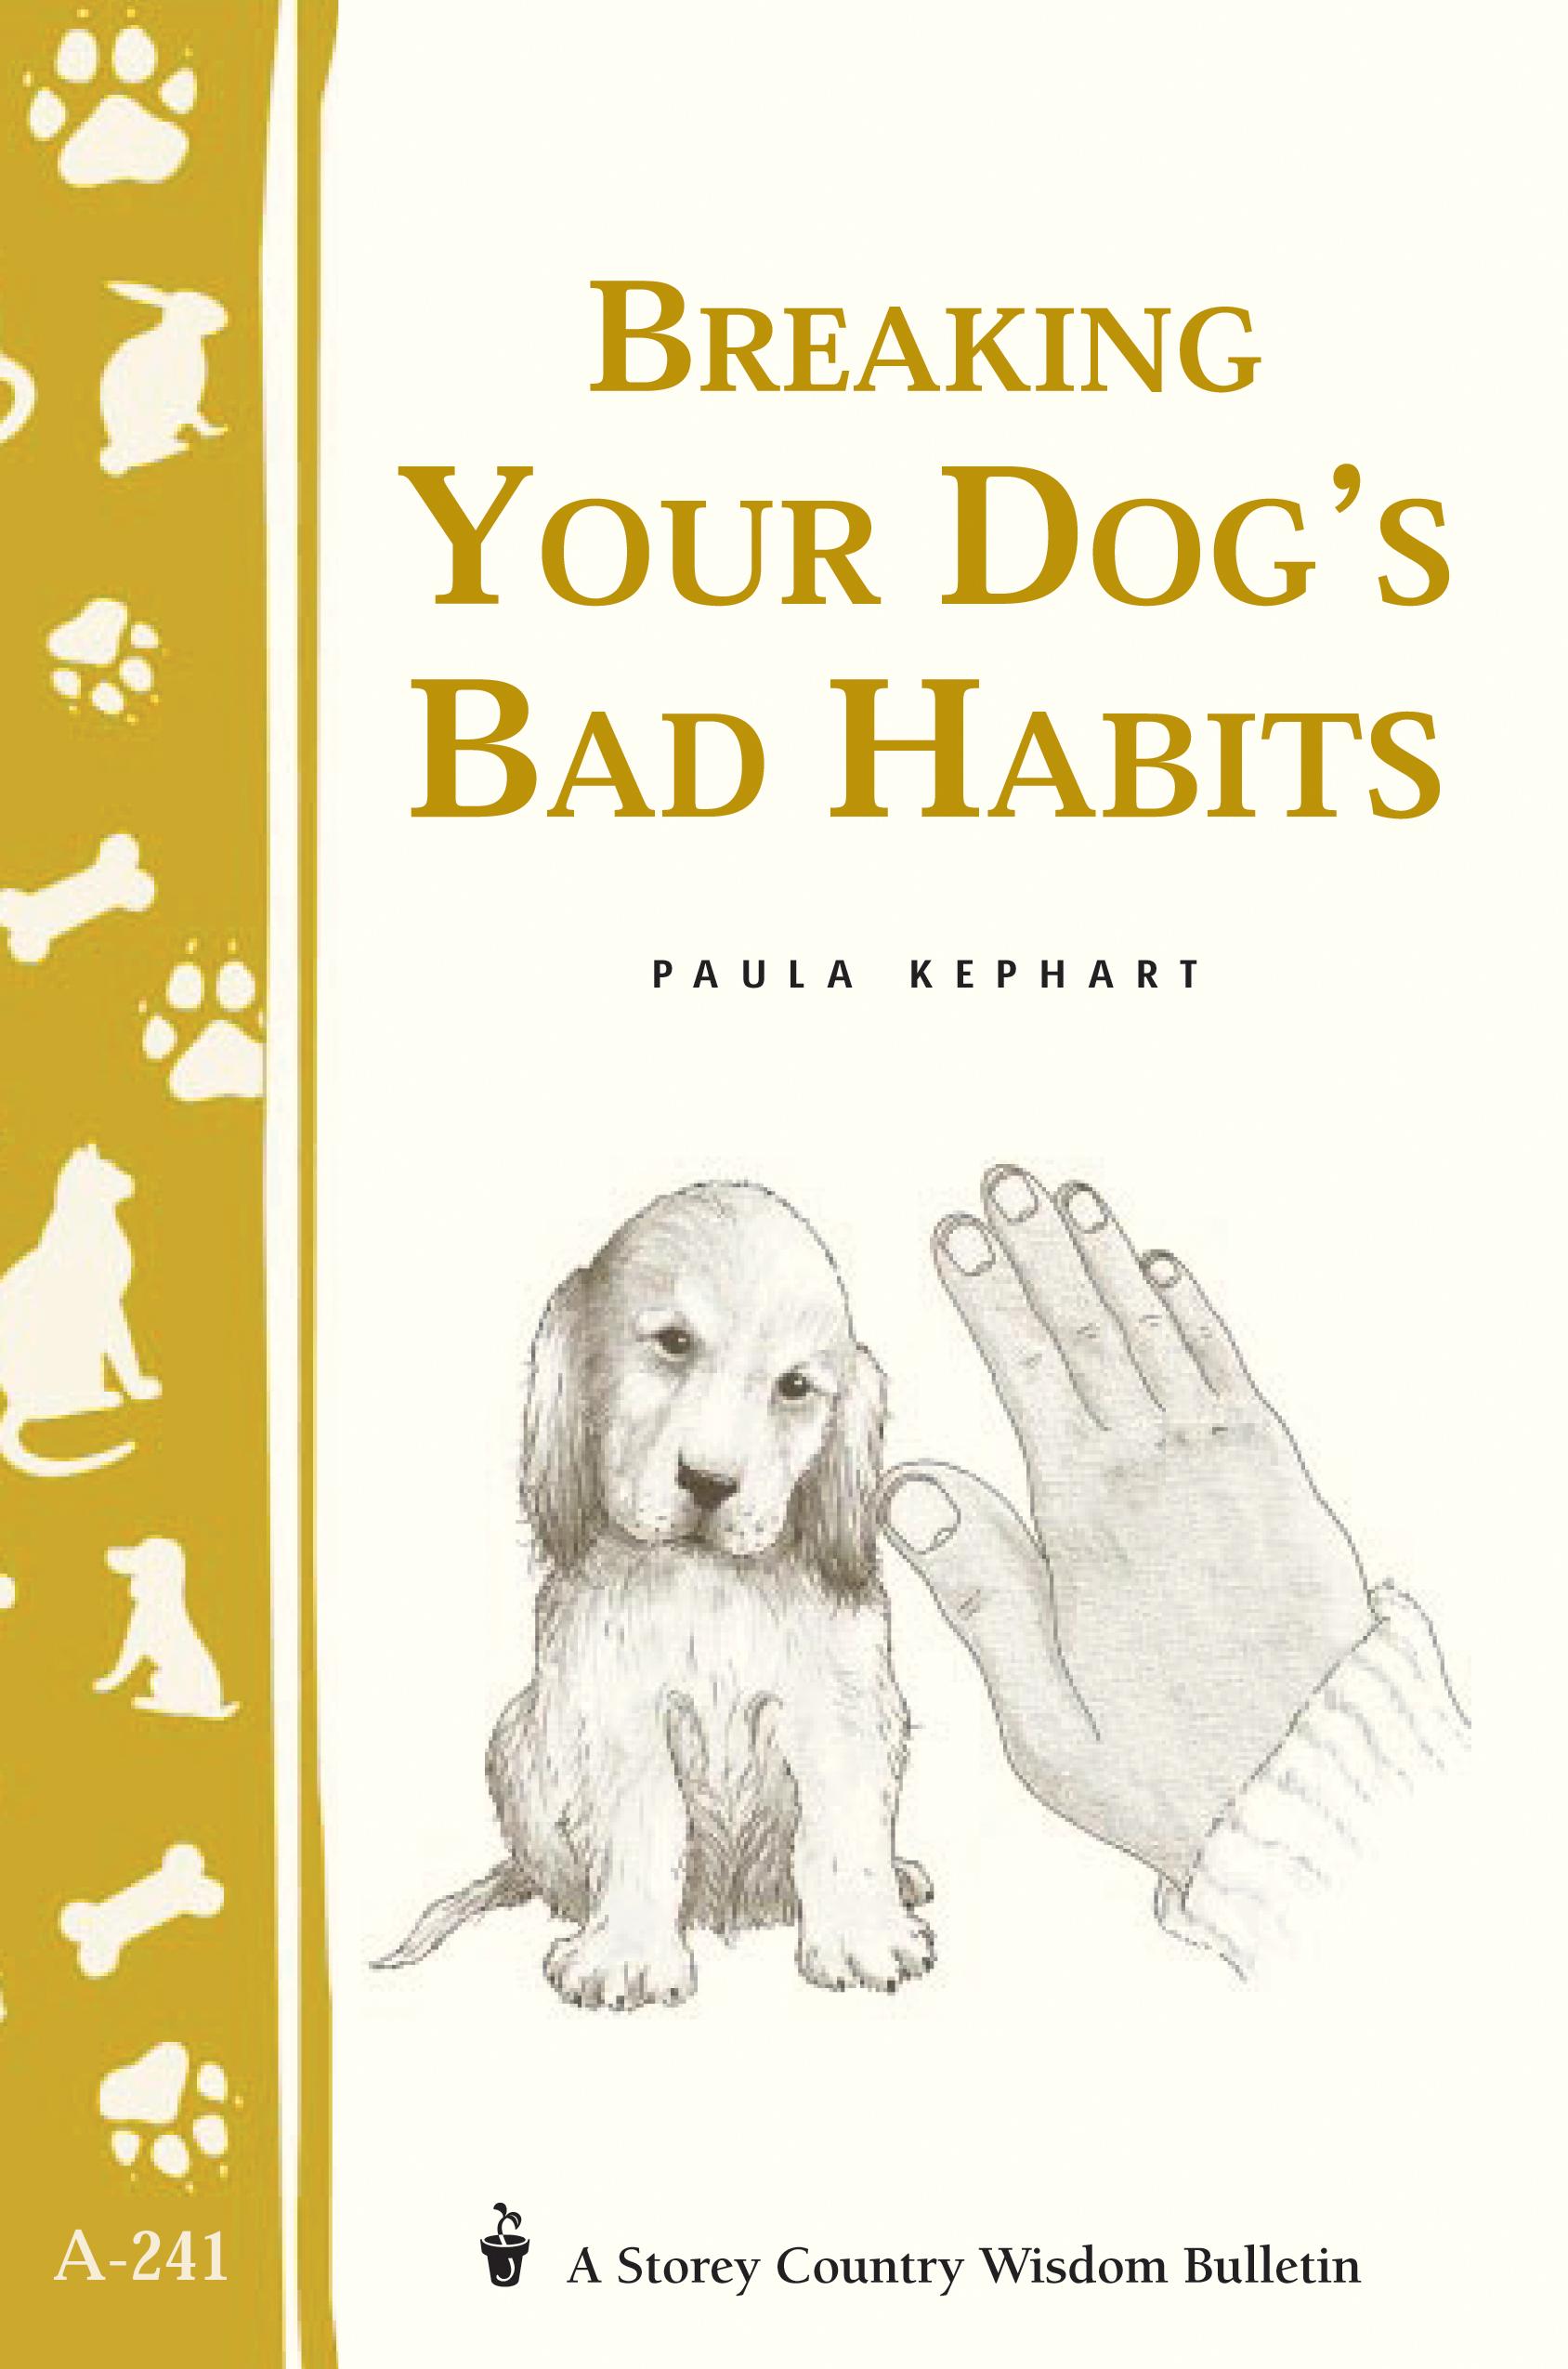 Breaking Your Dog's Bad Habits Storey's Country Wisdom Bulletin A-241 - Paula Kephart